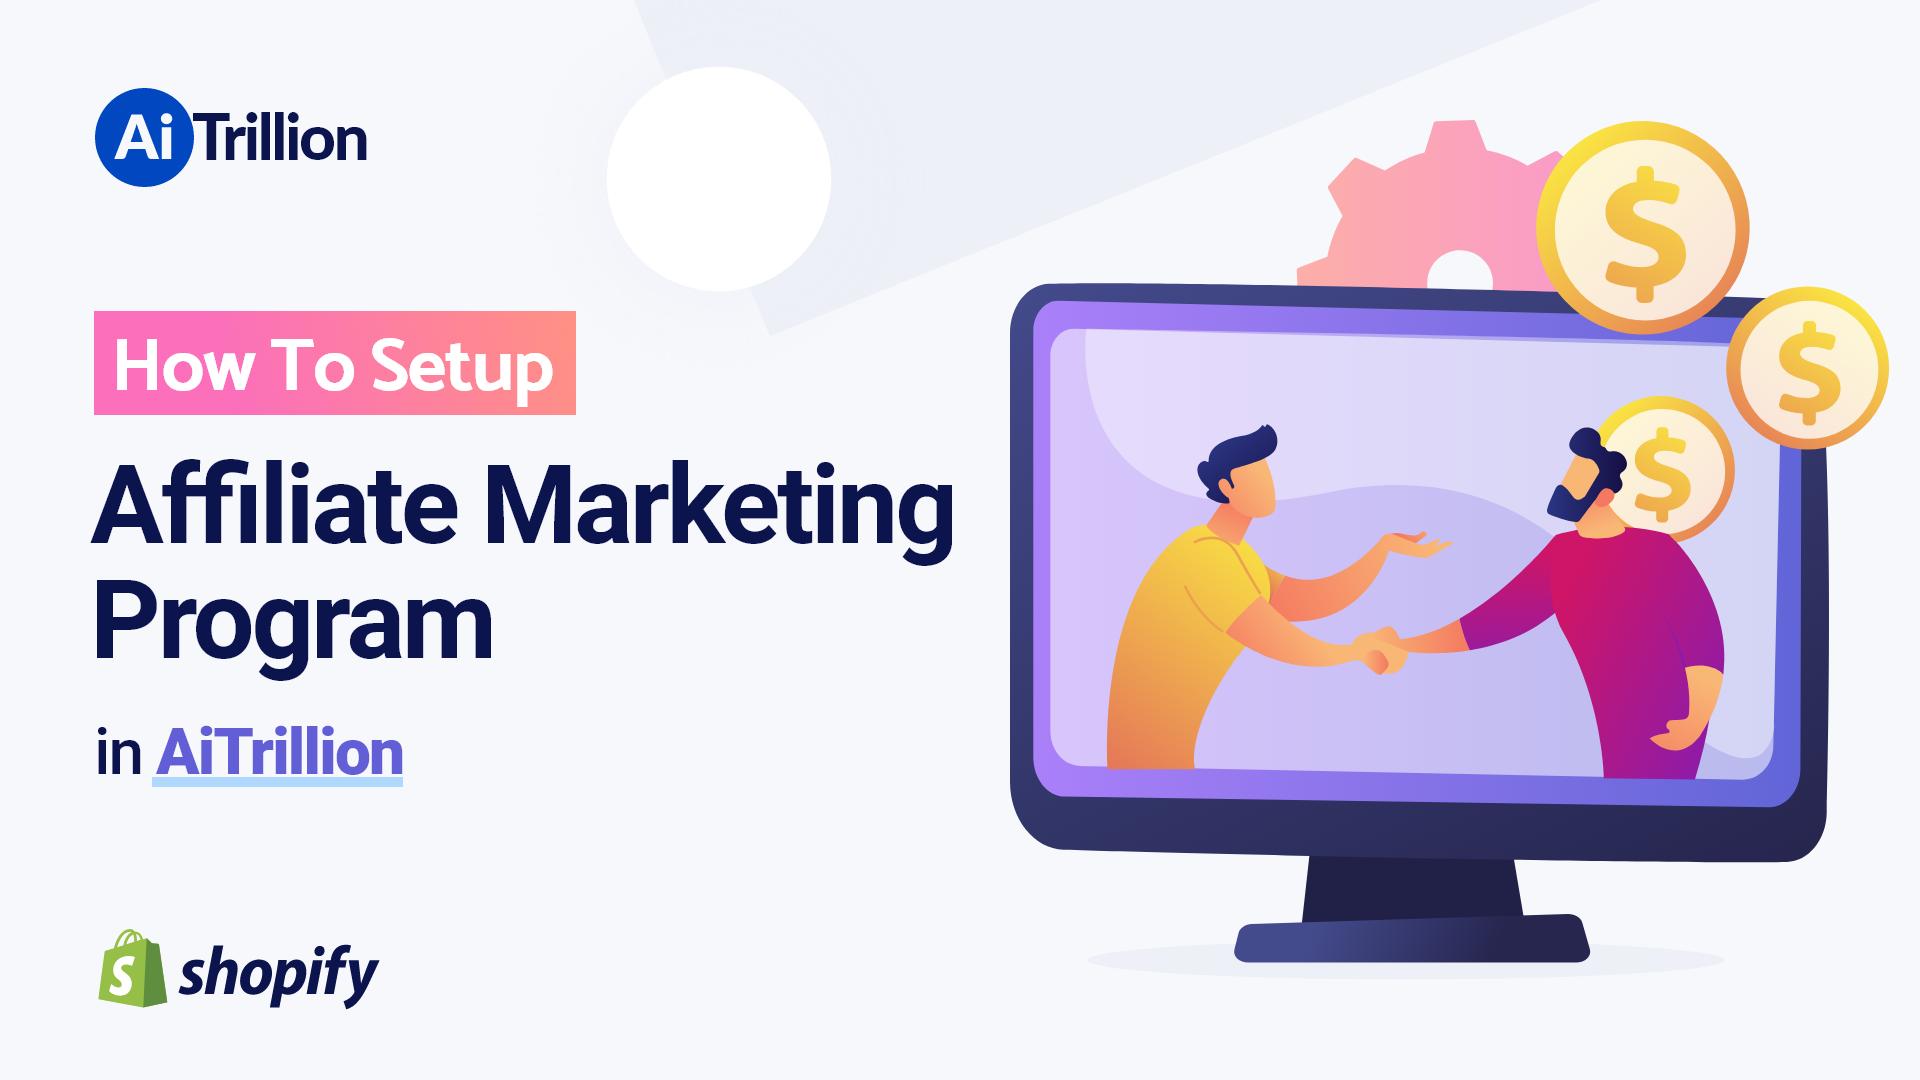 How To Setup Affiliate Marketing Program in aitrillion